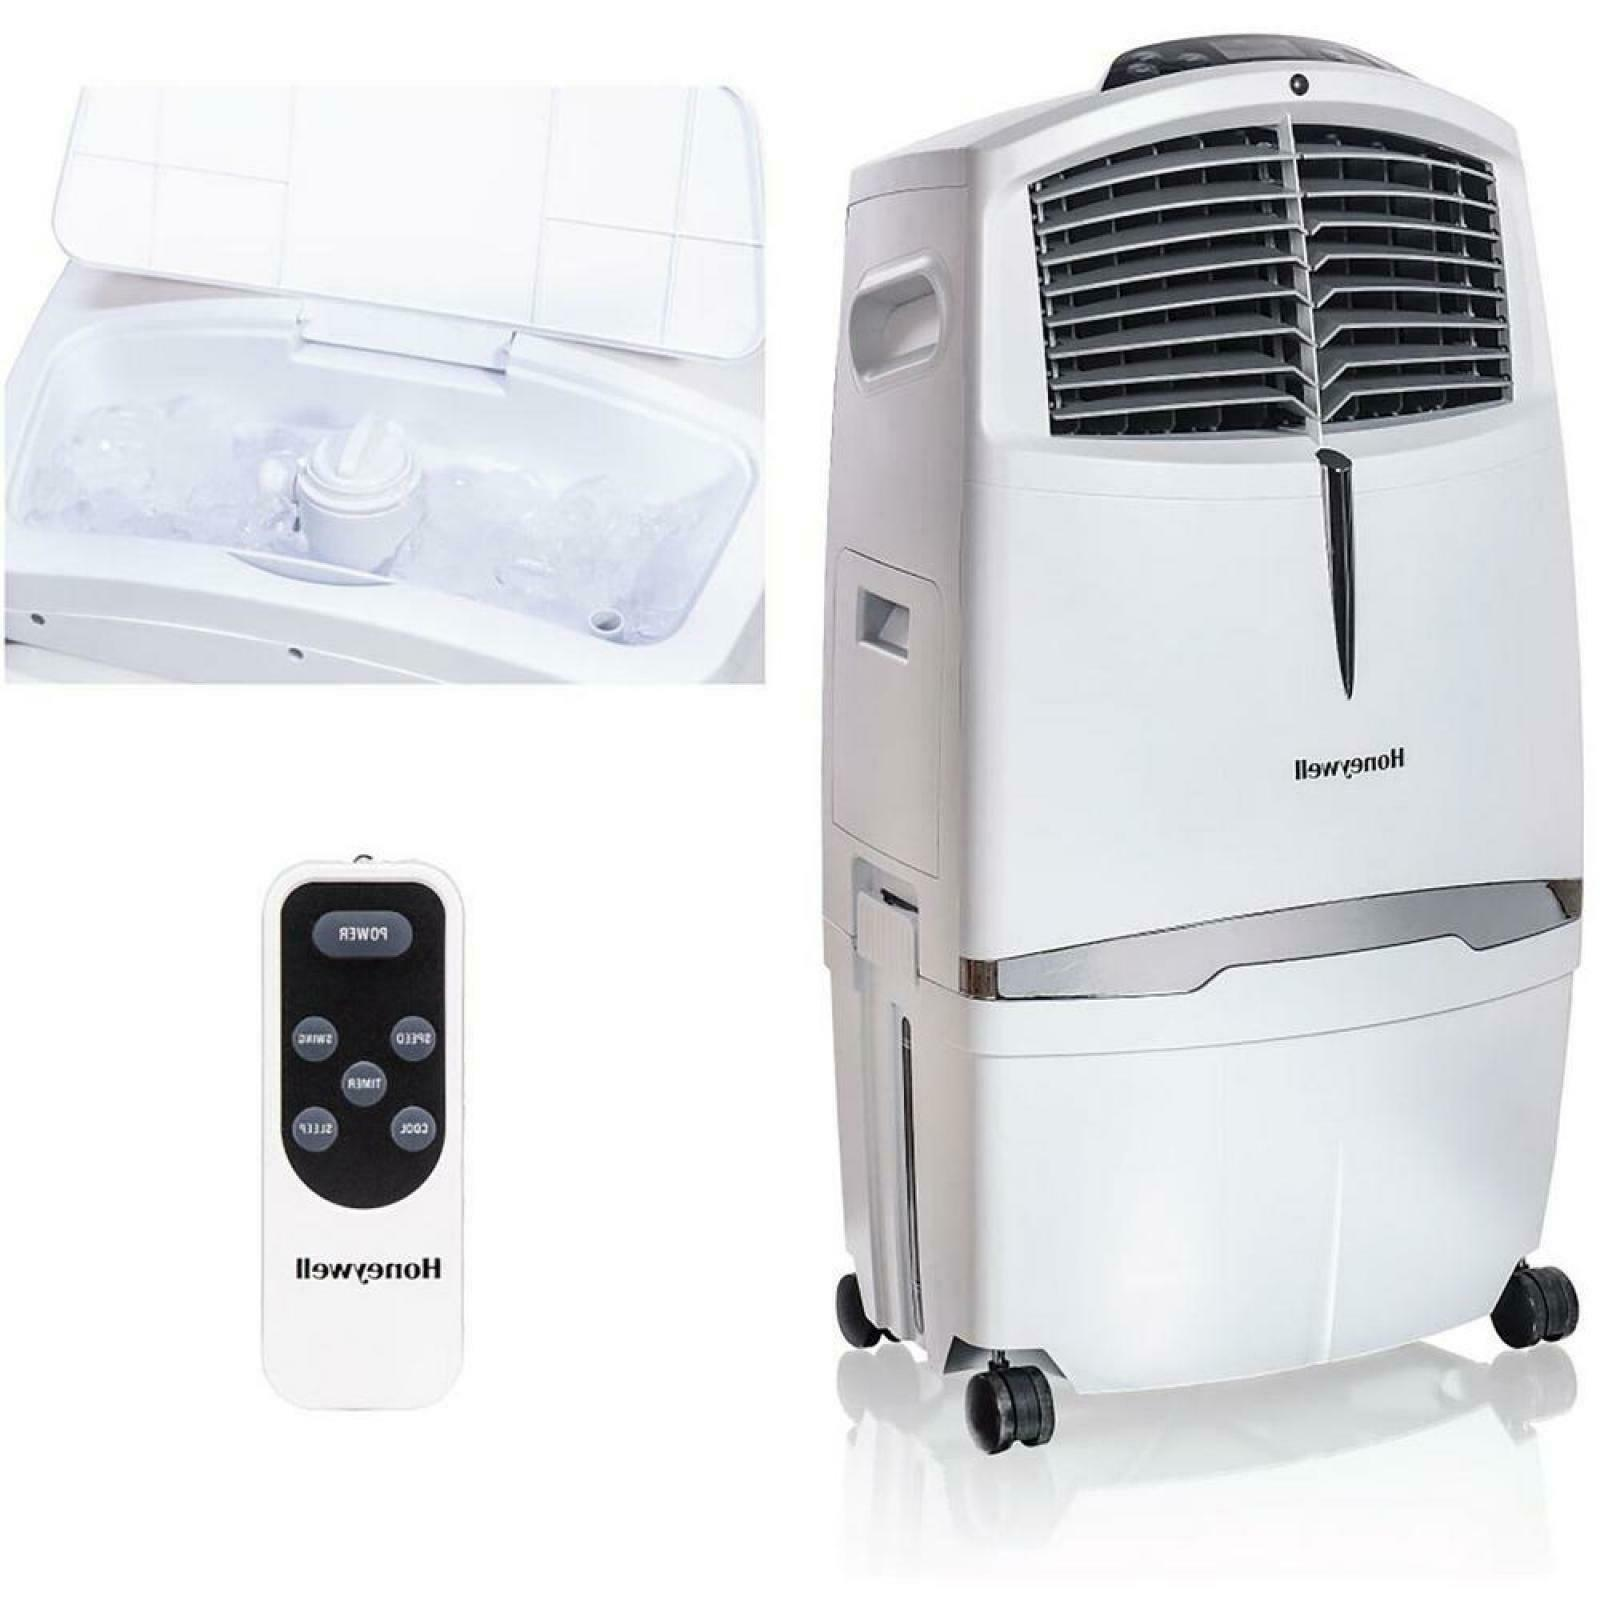 Honeywell - Portable Air Cooler - Gray